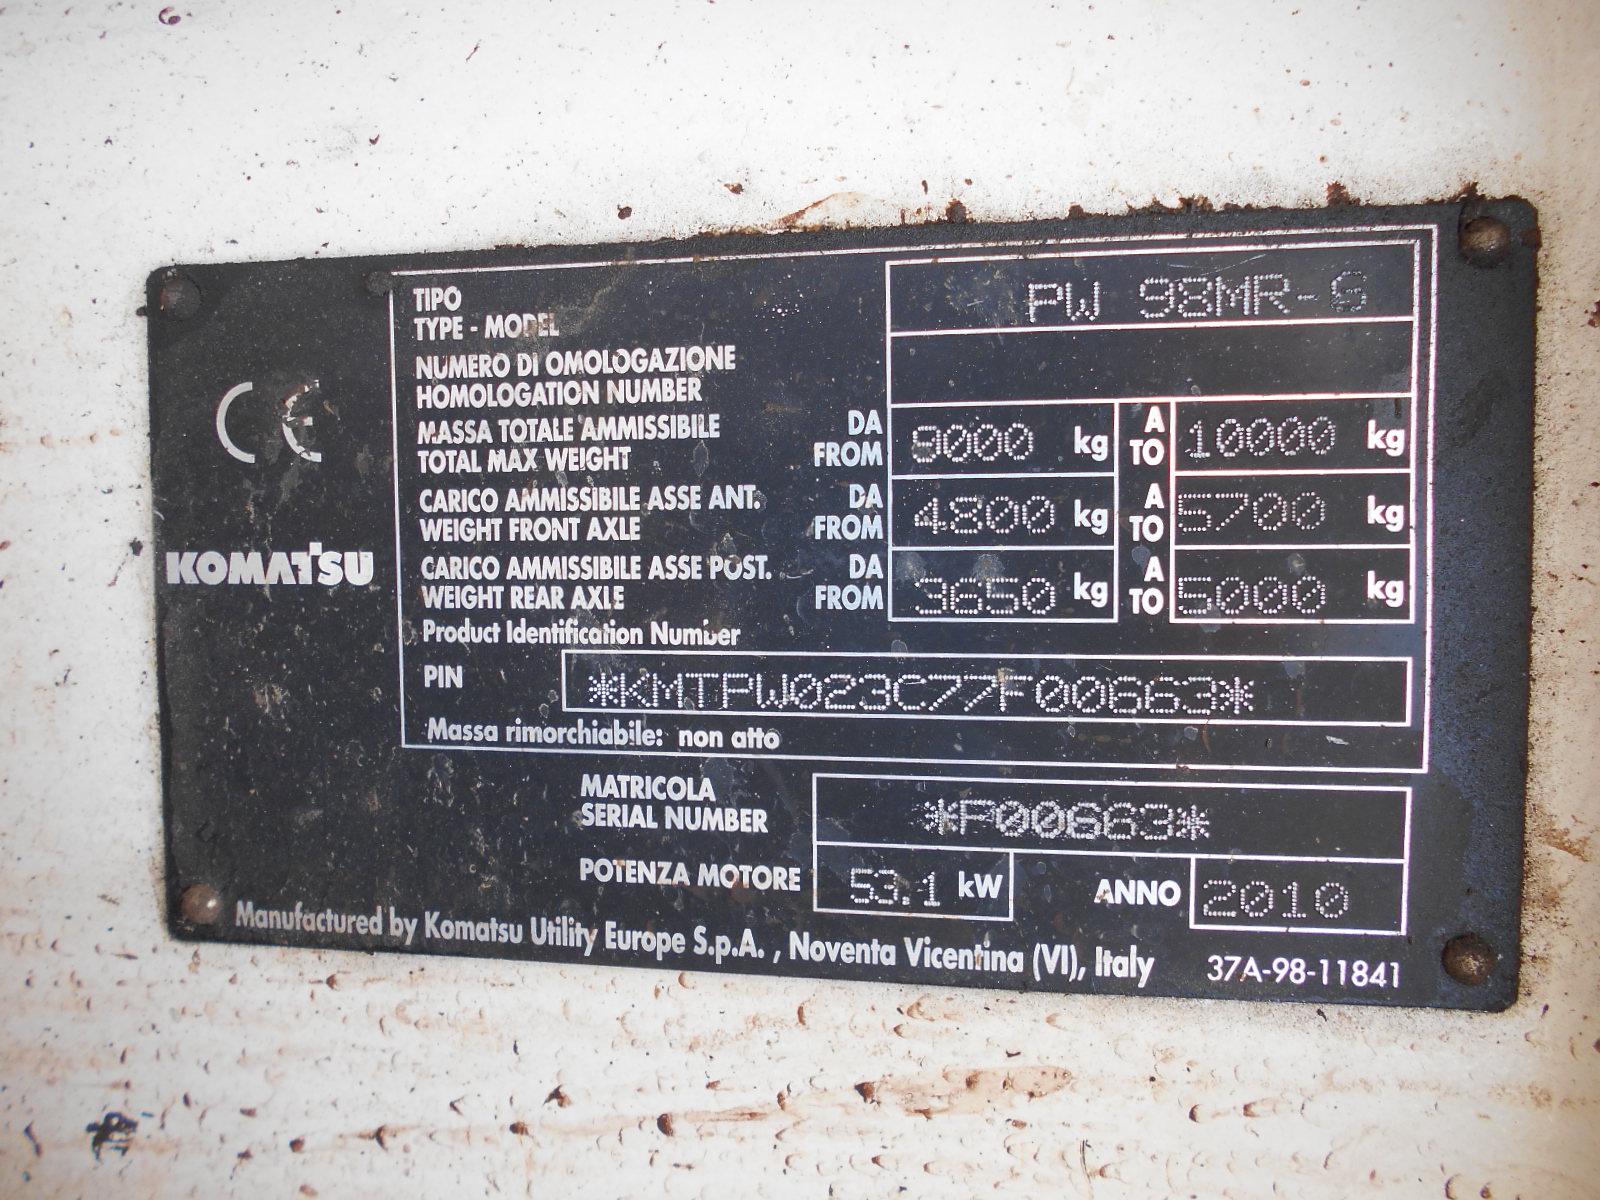 Komatsu PW98 022.JPG